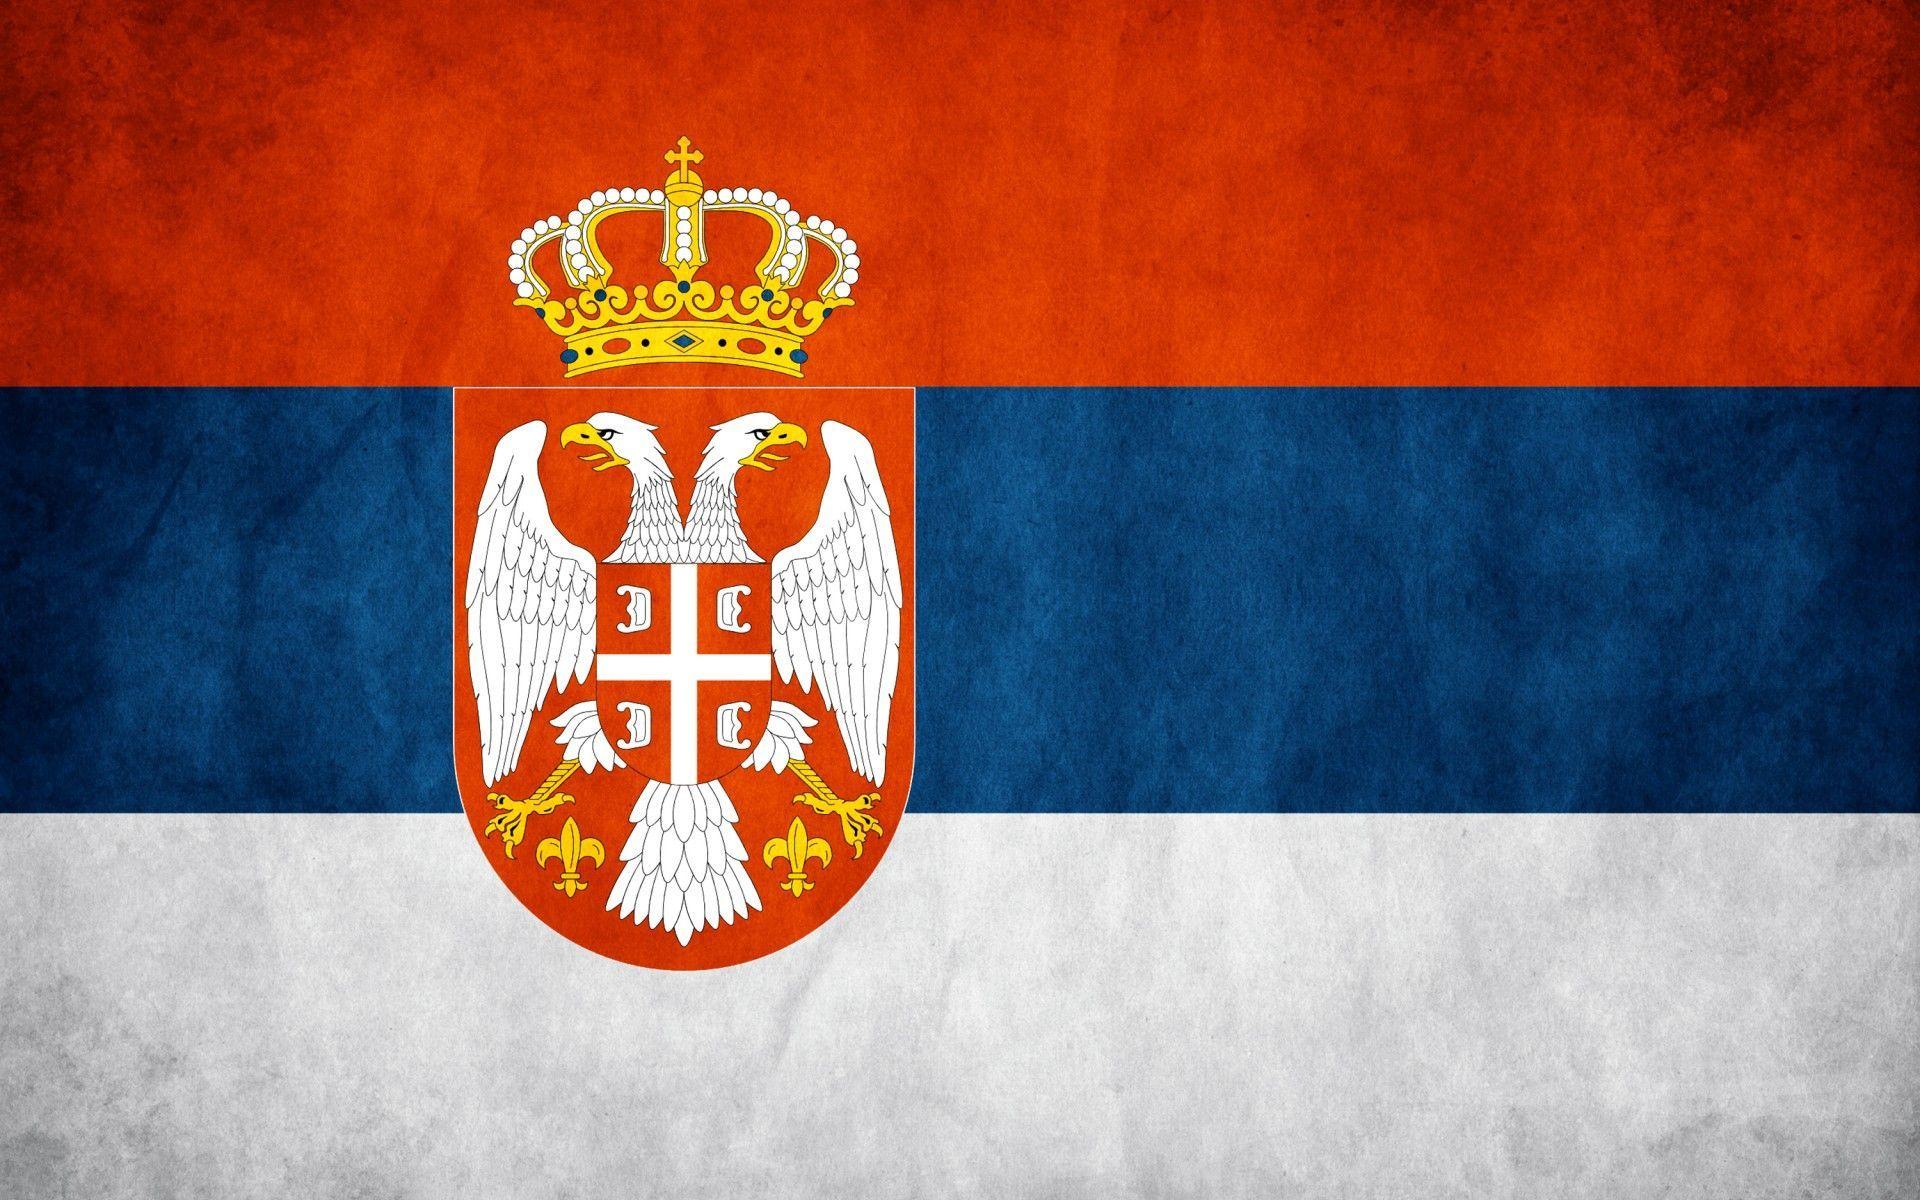 Serbia Wallpapers   52DazheW Gallery 1920x1200